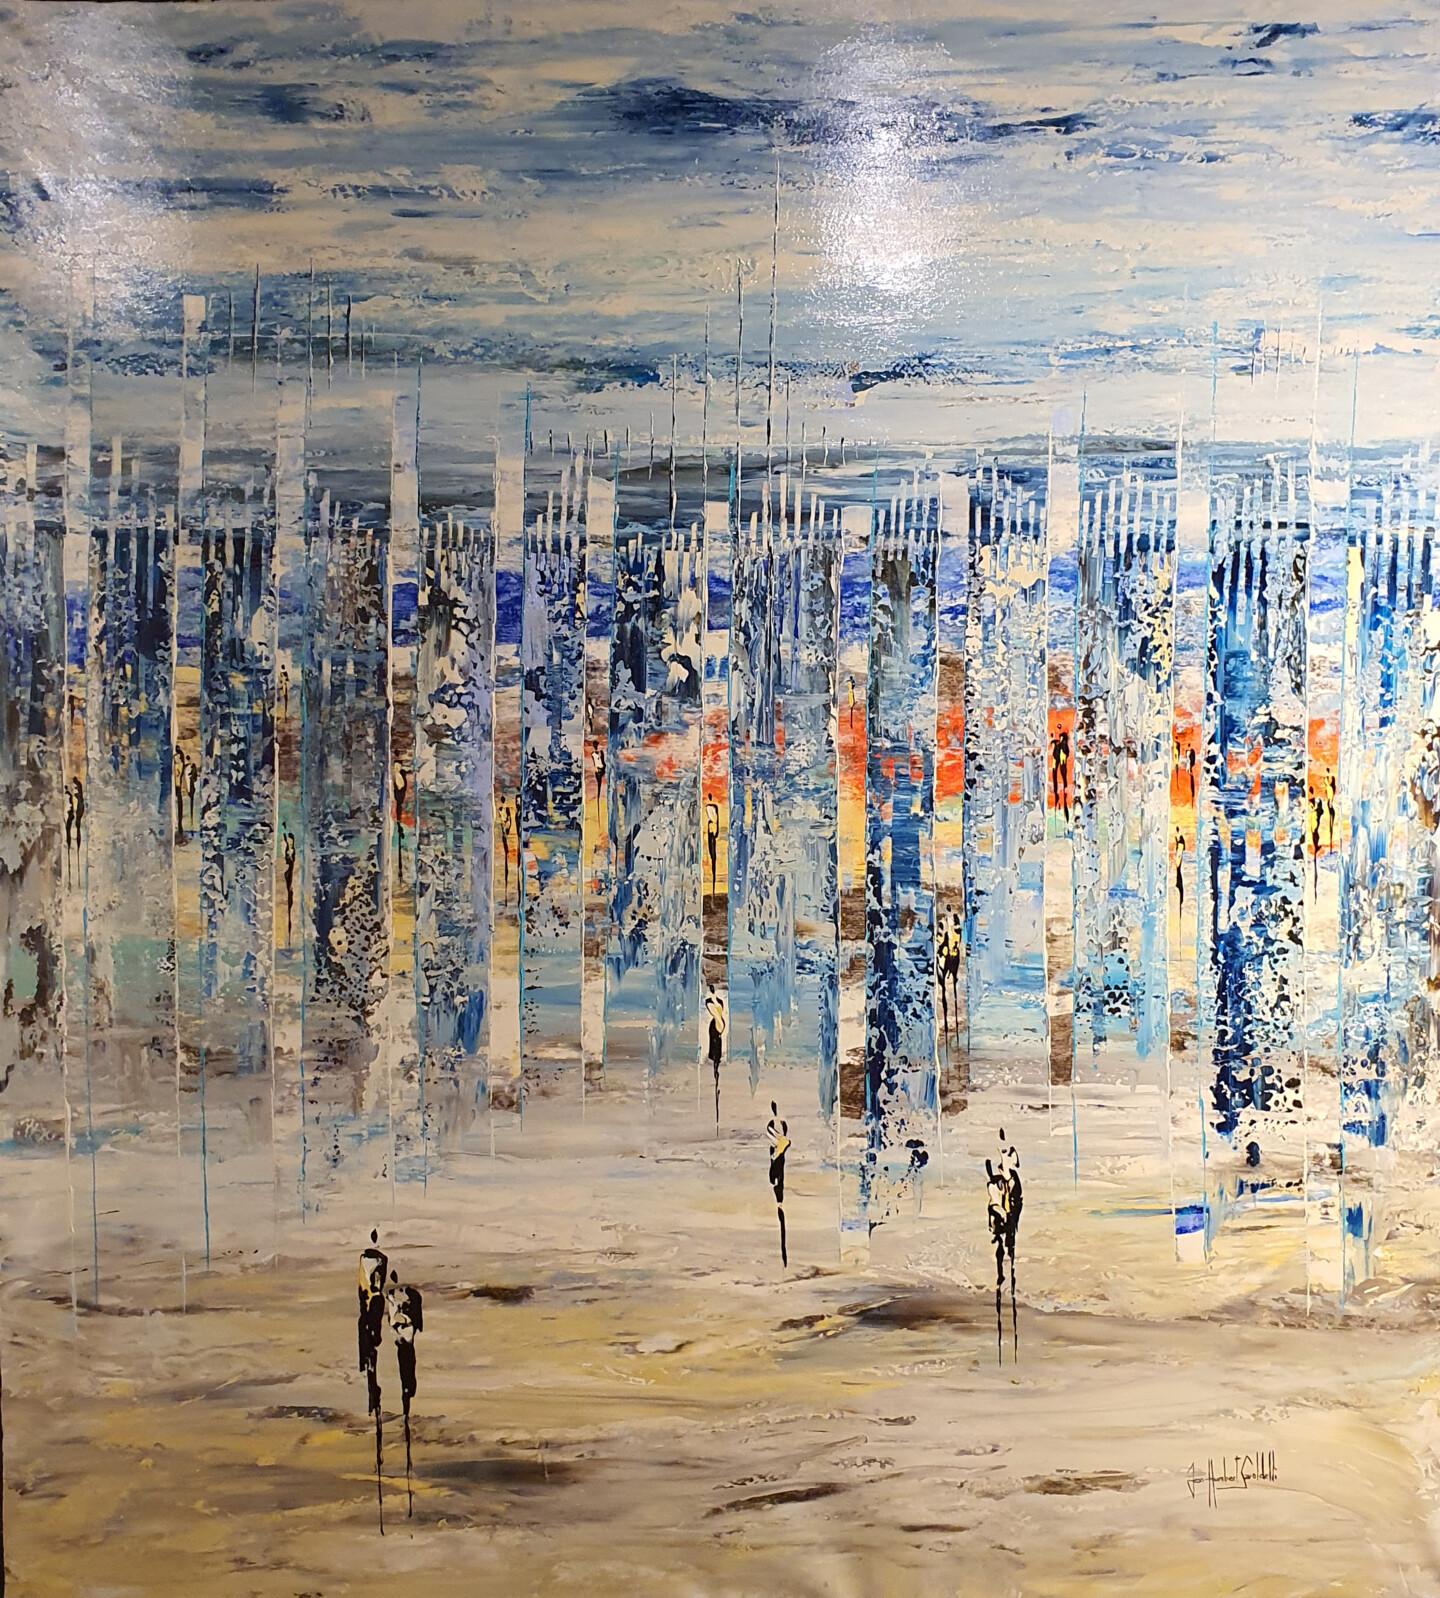 Jean-Humbert Savoldelli - SOLSTICE